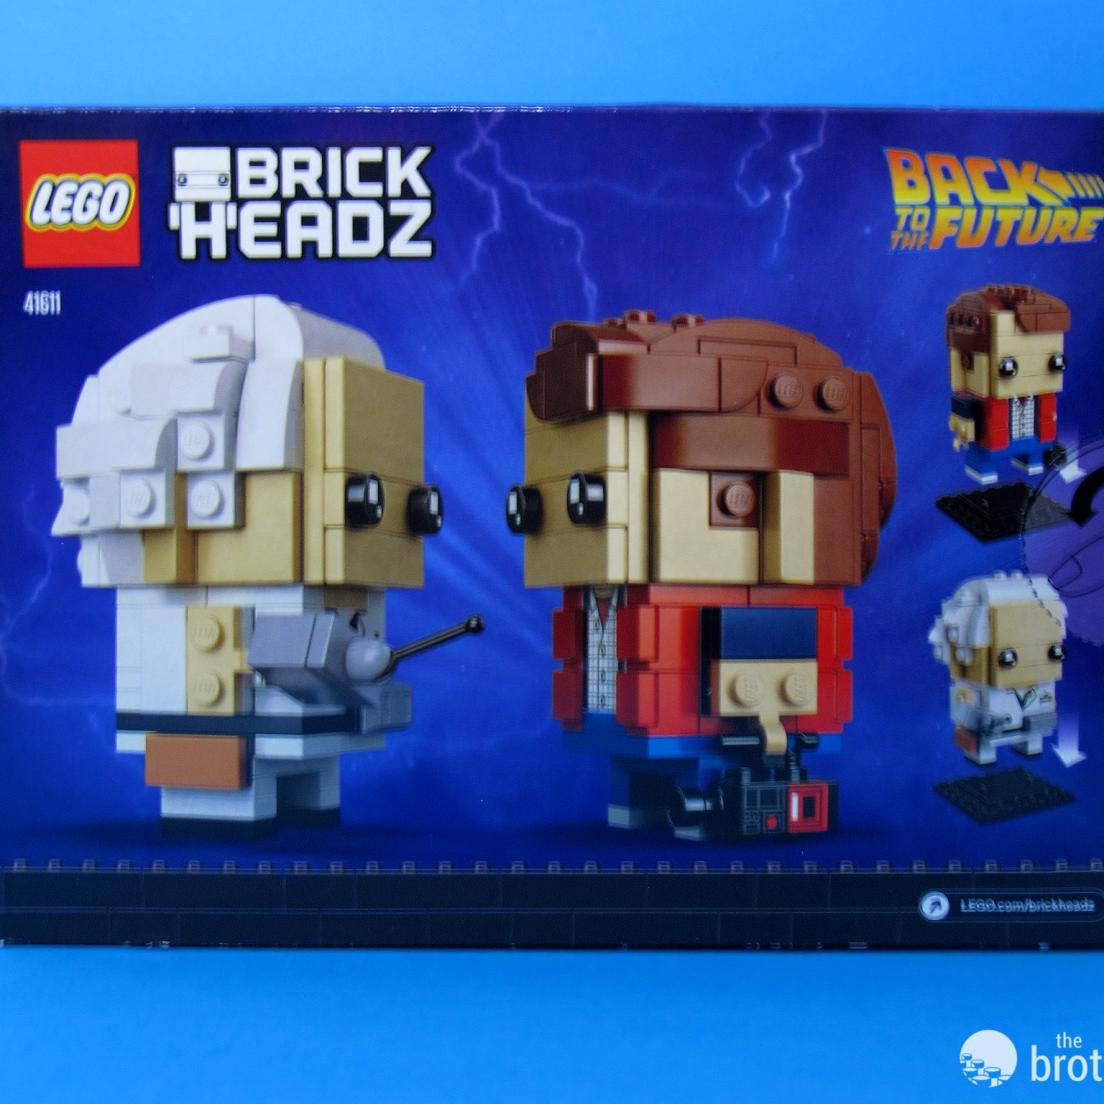 41611 Back To the Future BrickHeadz Box Back